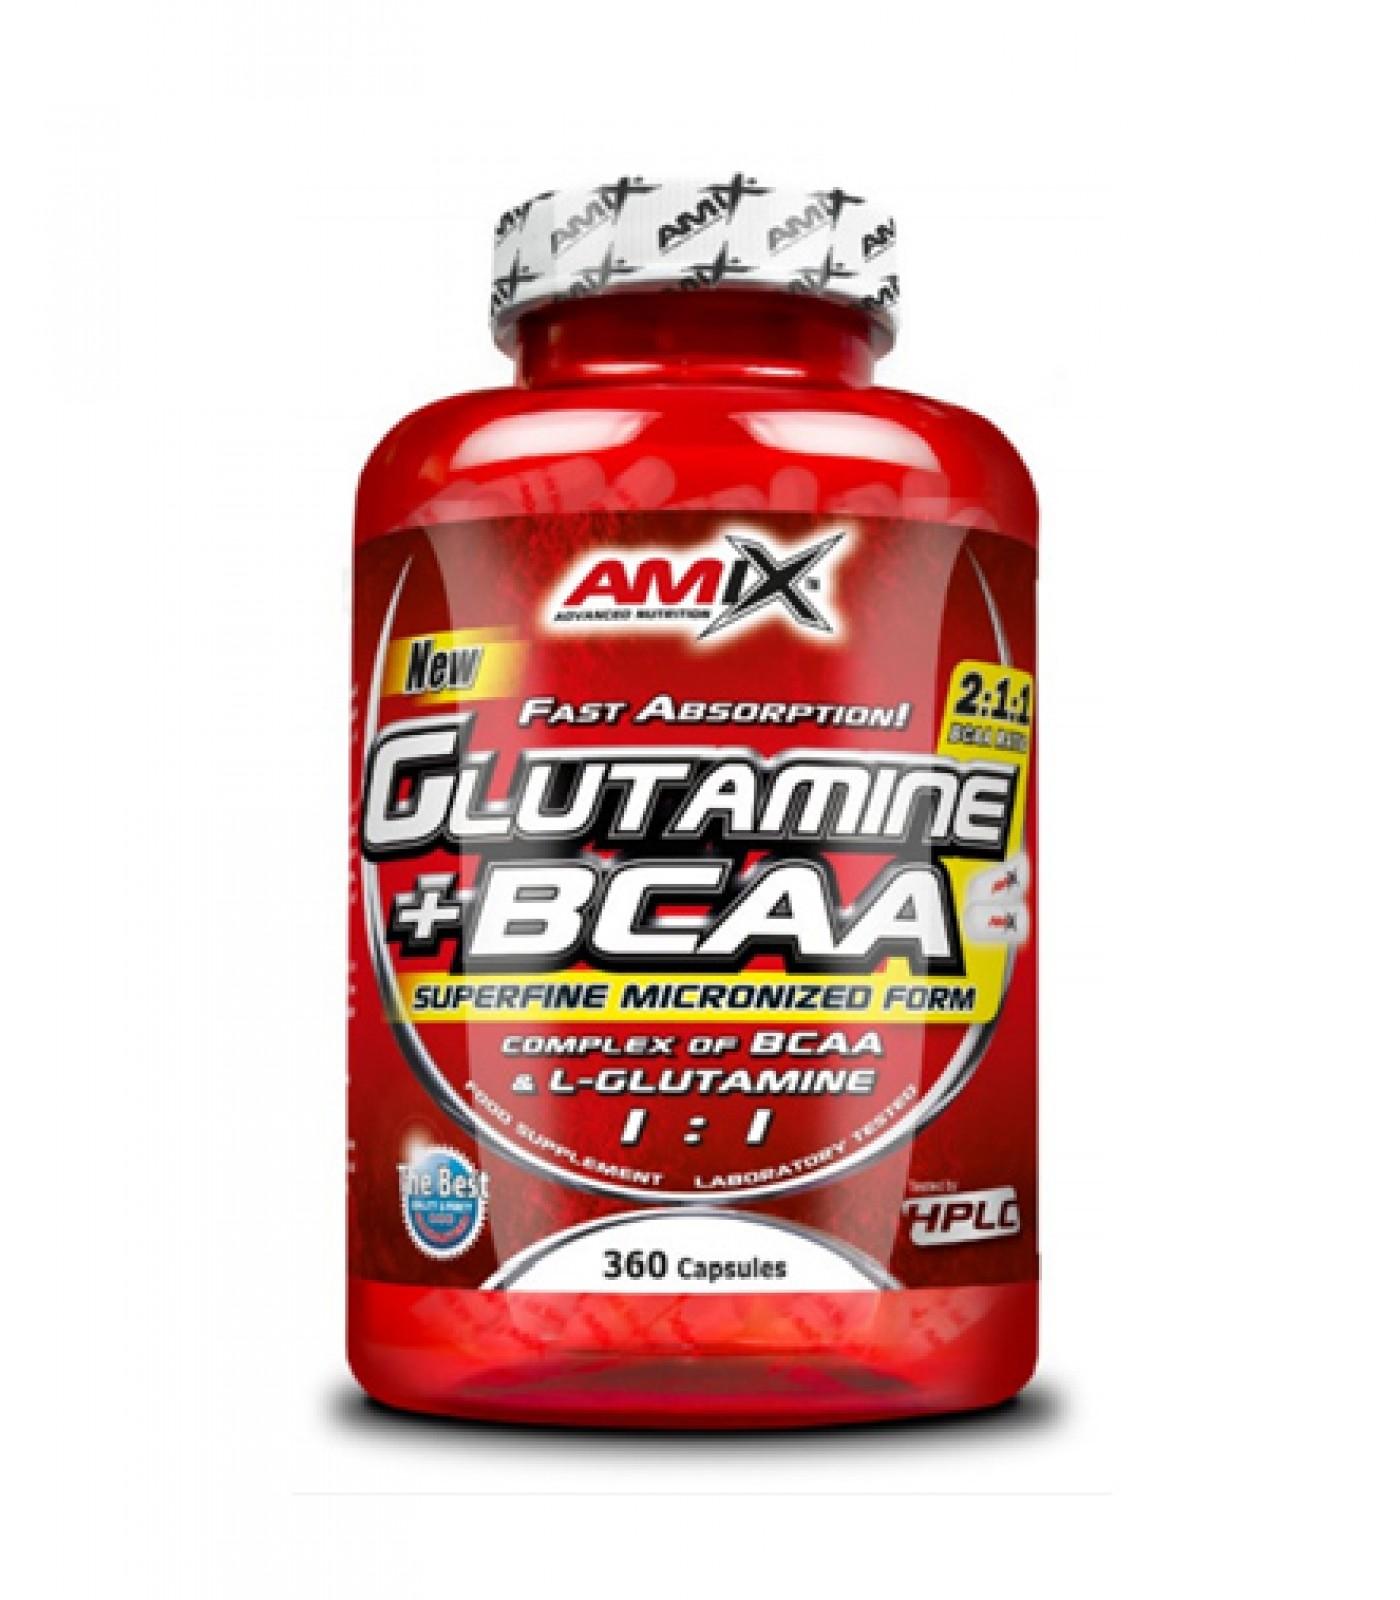 Amix - Glutamine + BCAA / 360 Caps.